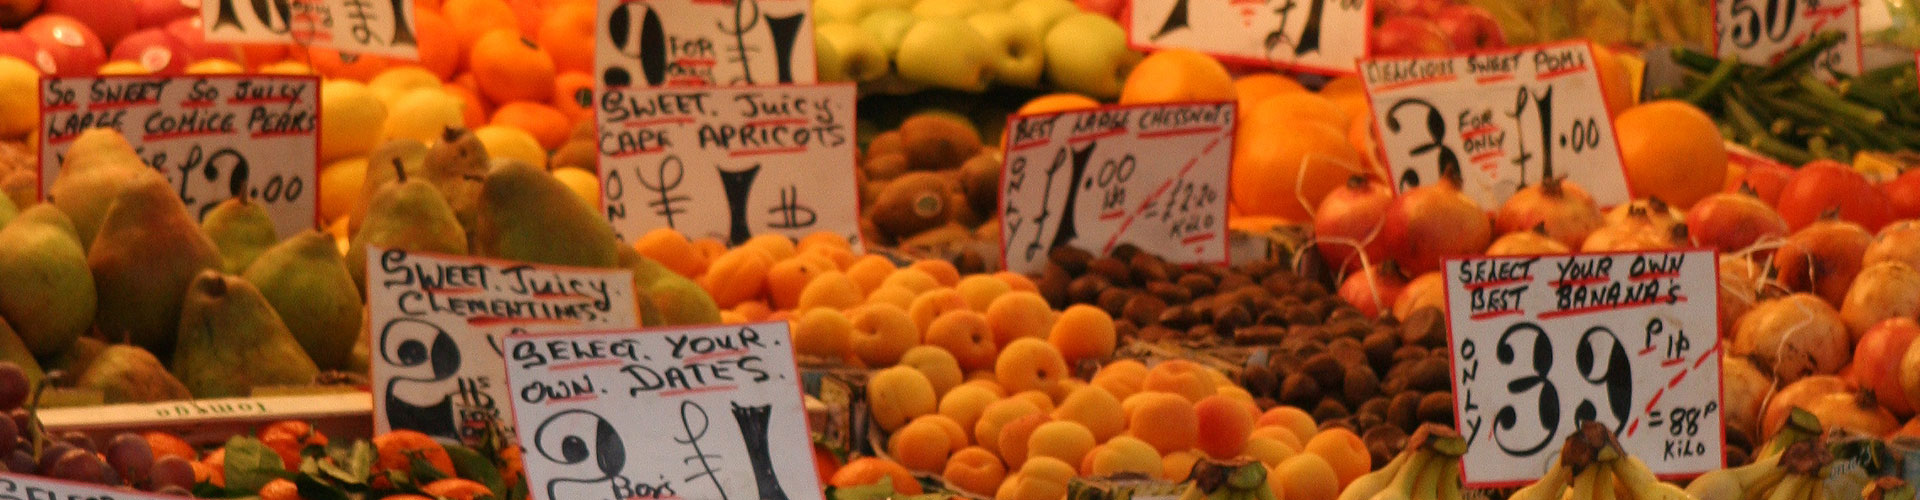 Lewisham Council Markets